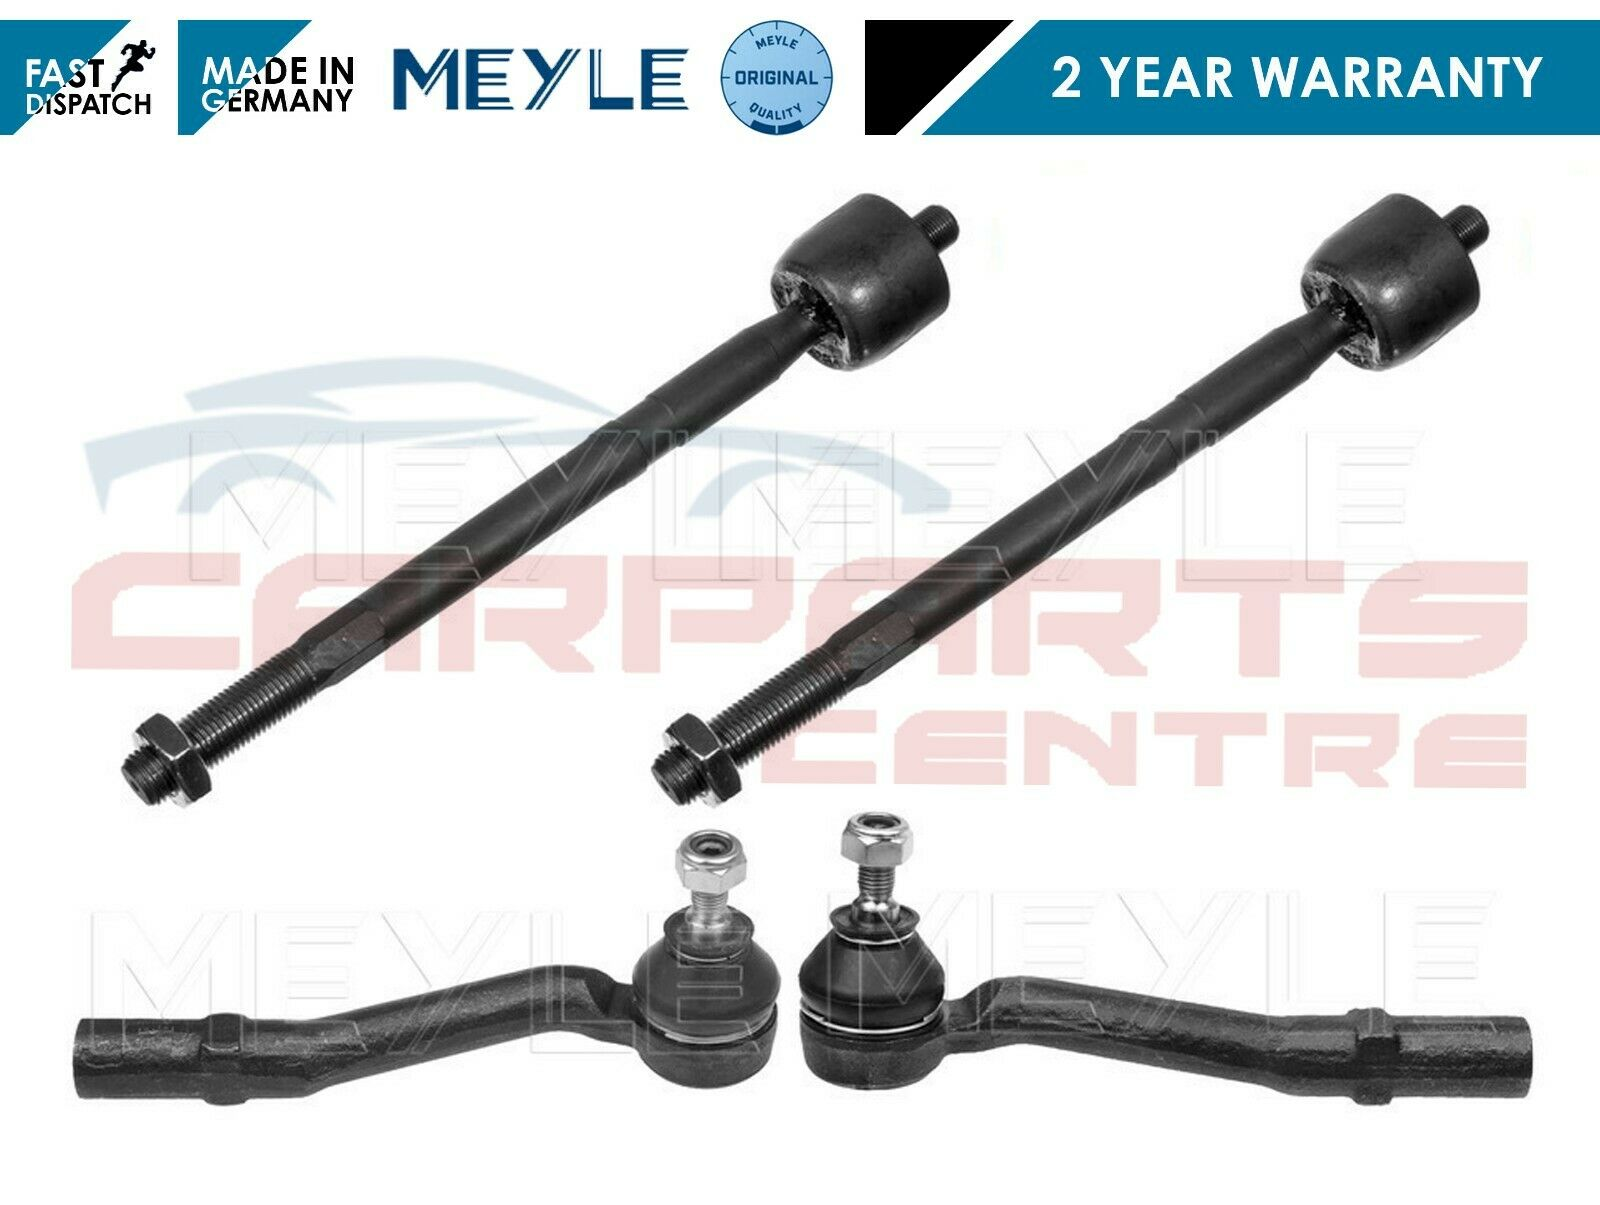 Mercedes 12954057 Instrument Cluster Part 03R129 SL W140 Rev Counter